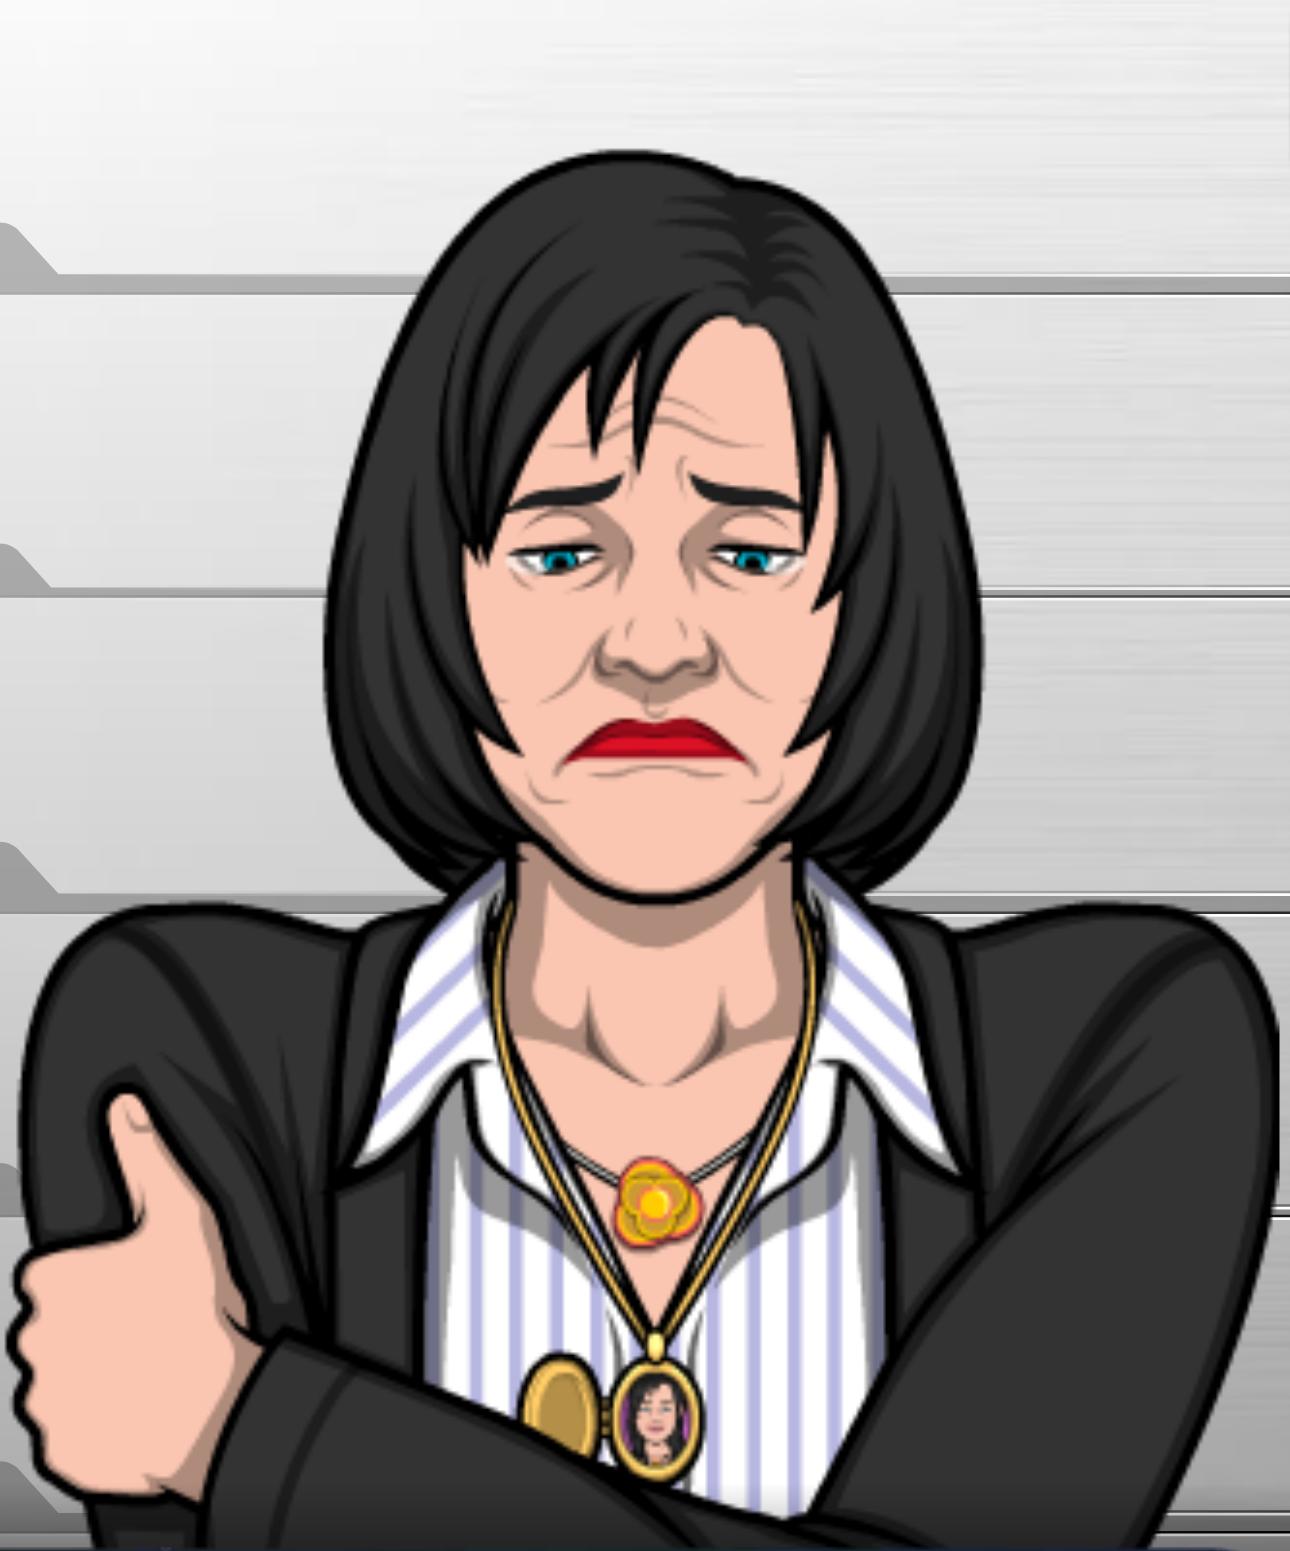 Ezekielfan22/Marie Bordeaux (Criminal Case)